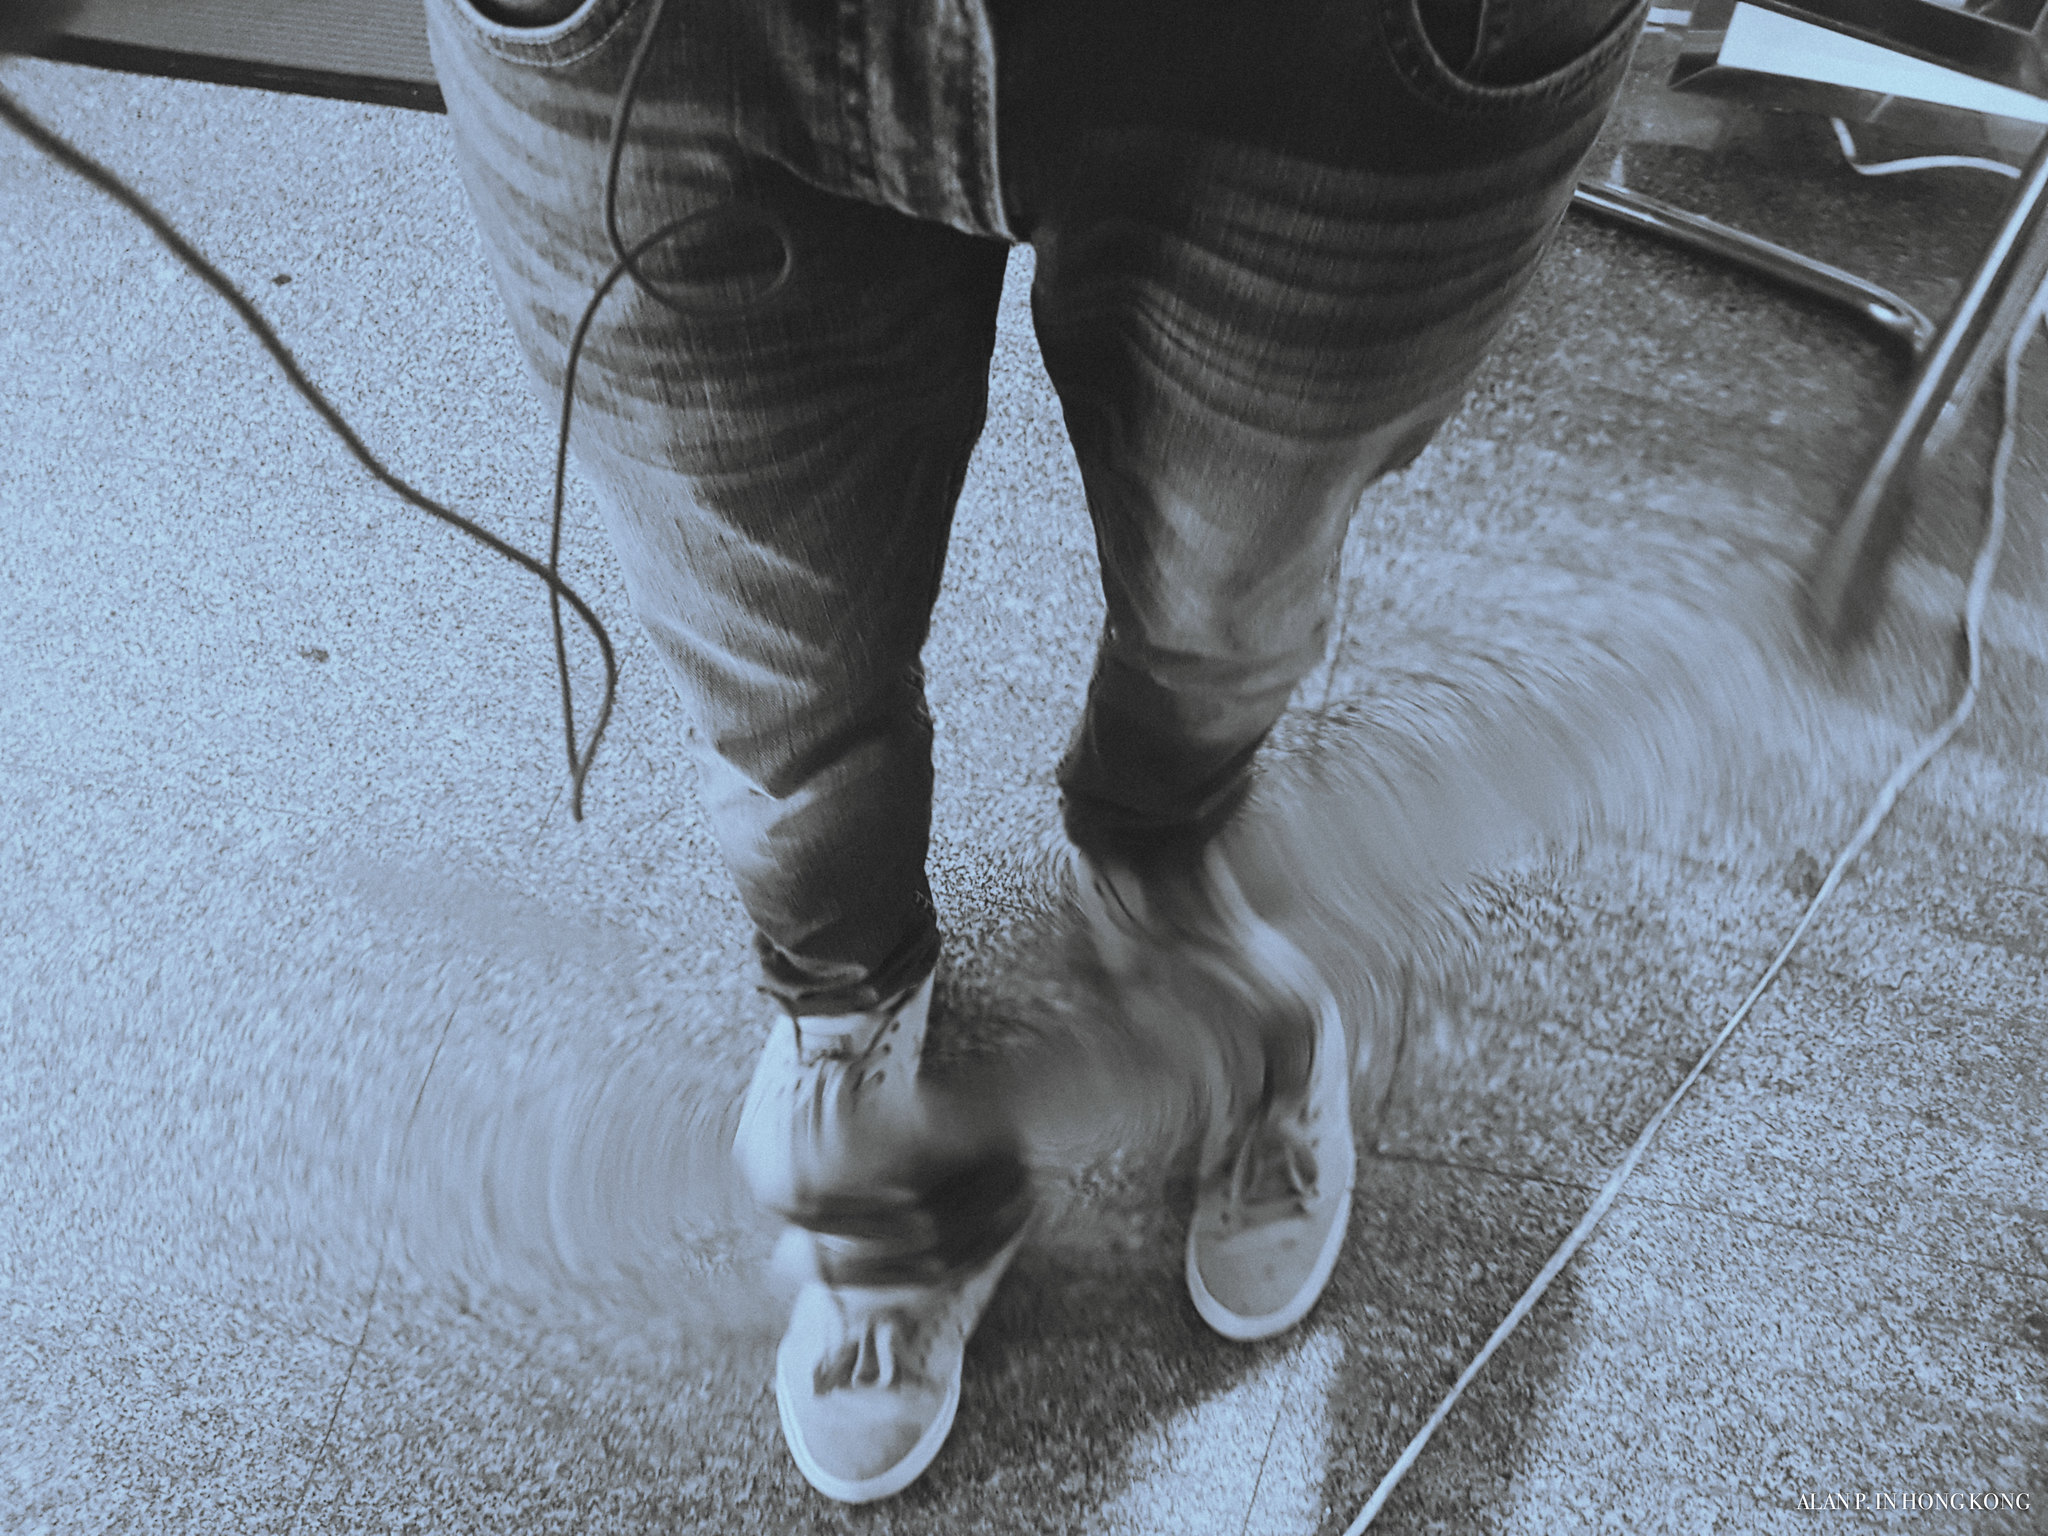 Distorted legs